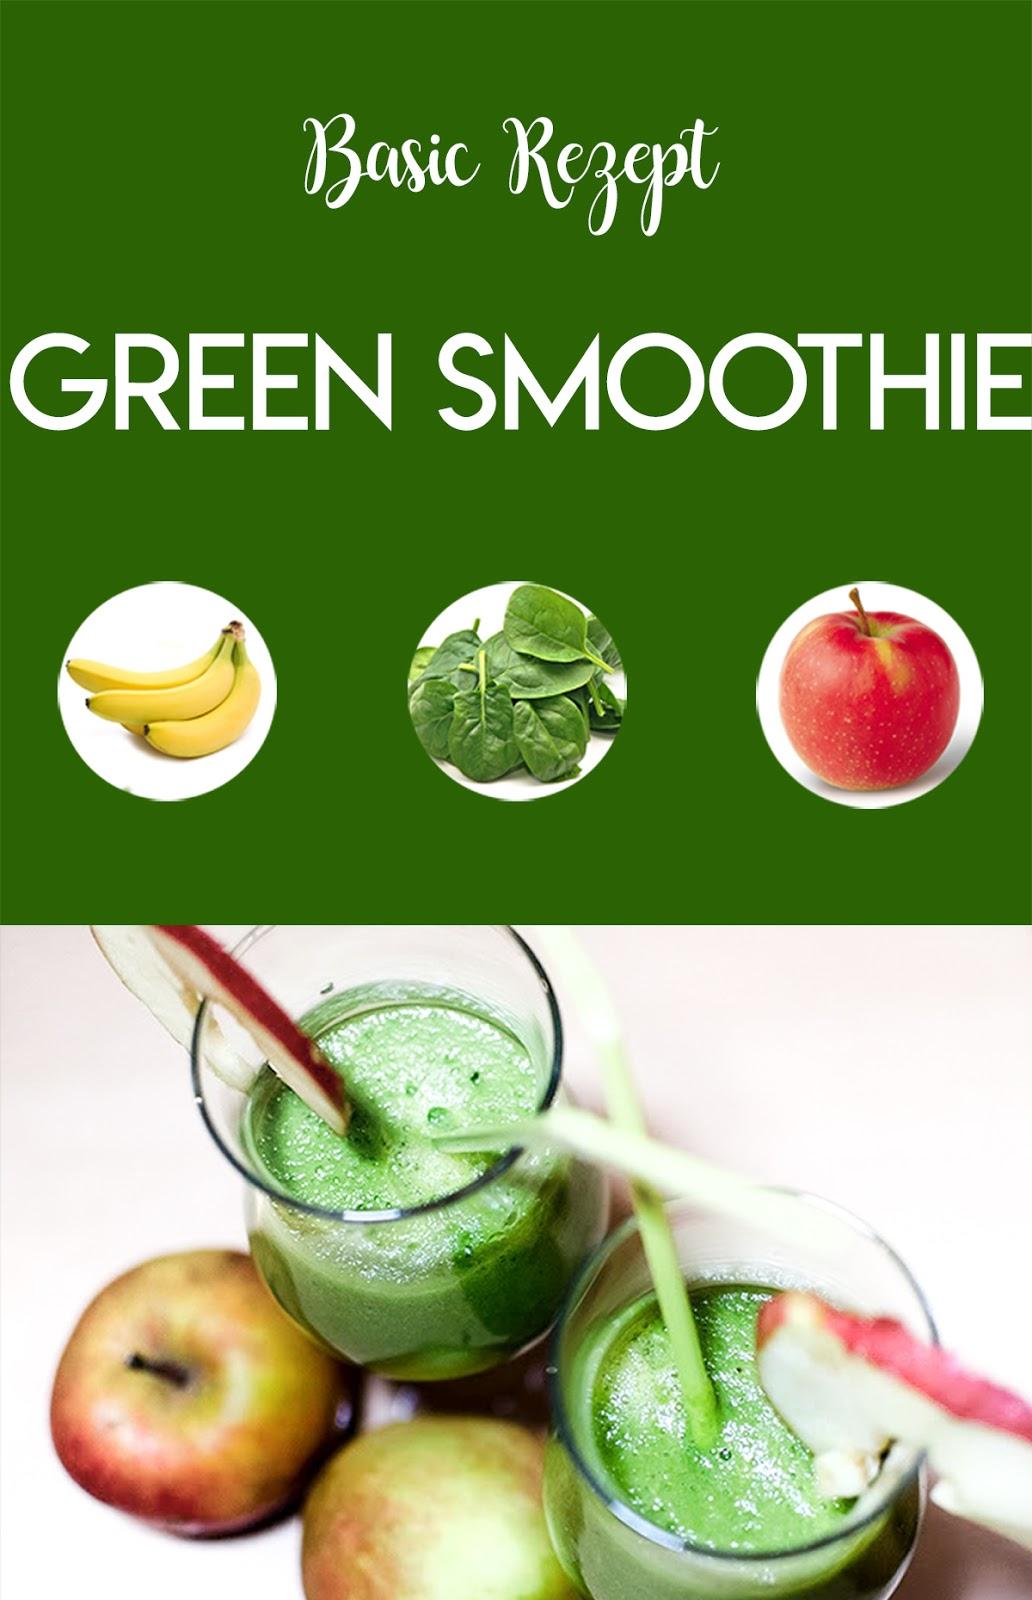 green-smoothie-rezept-basic-rezept